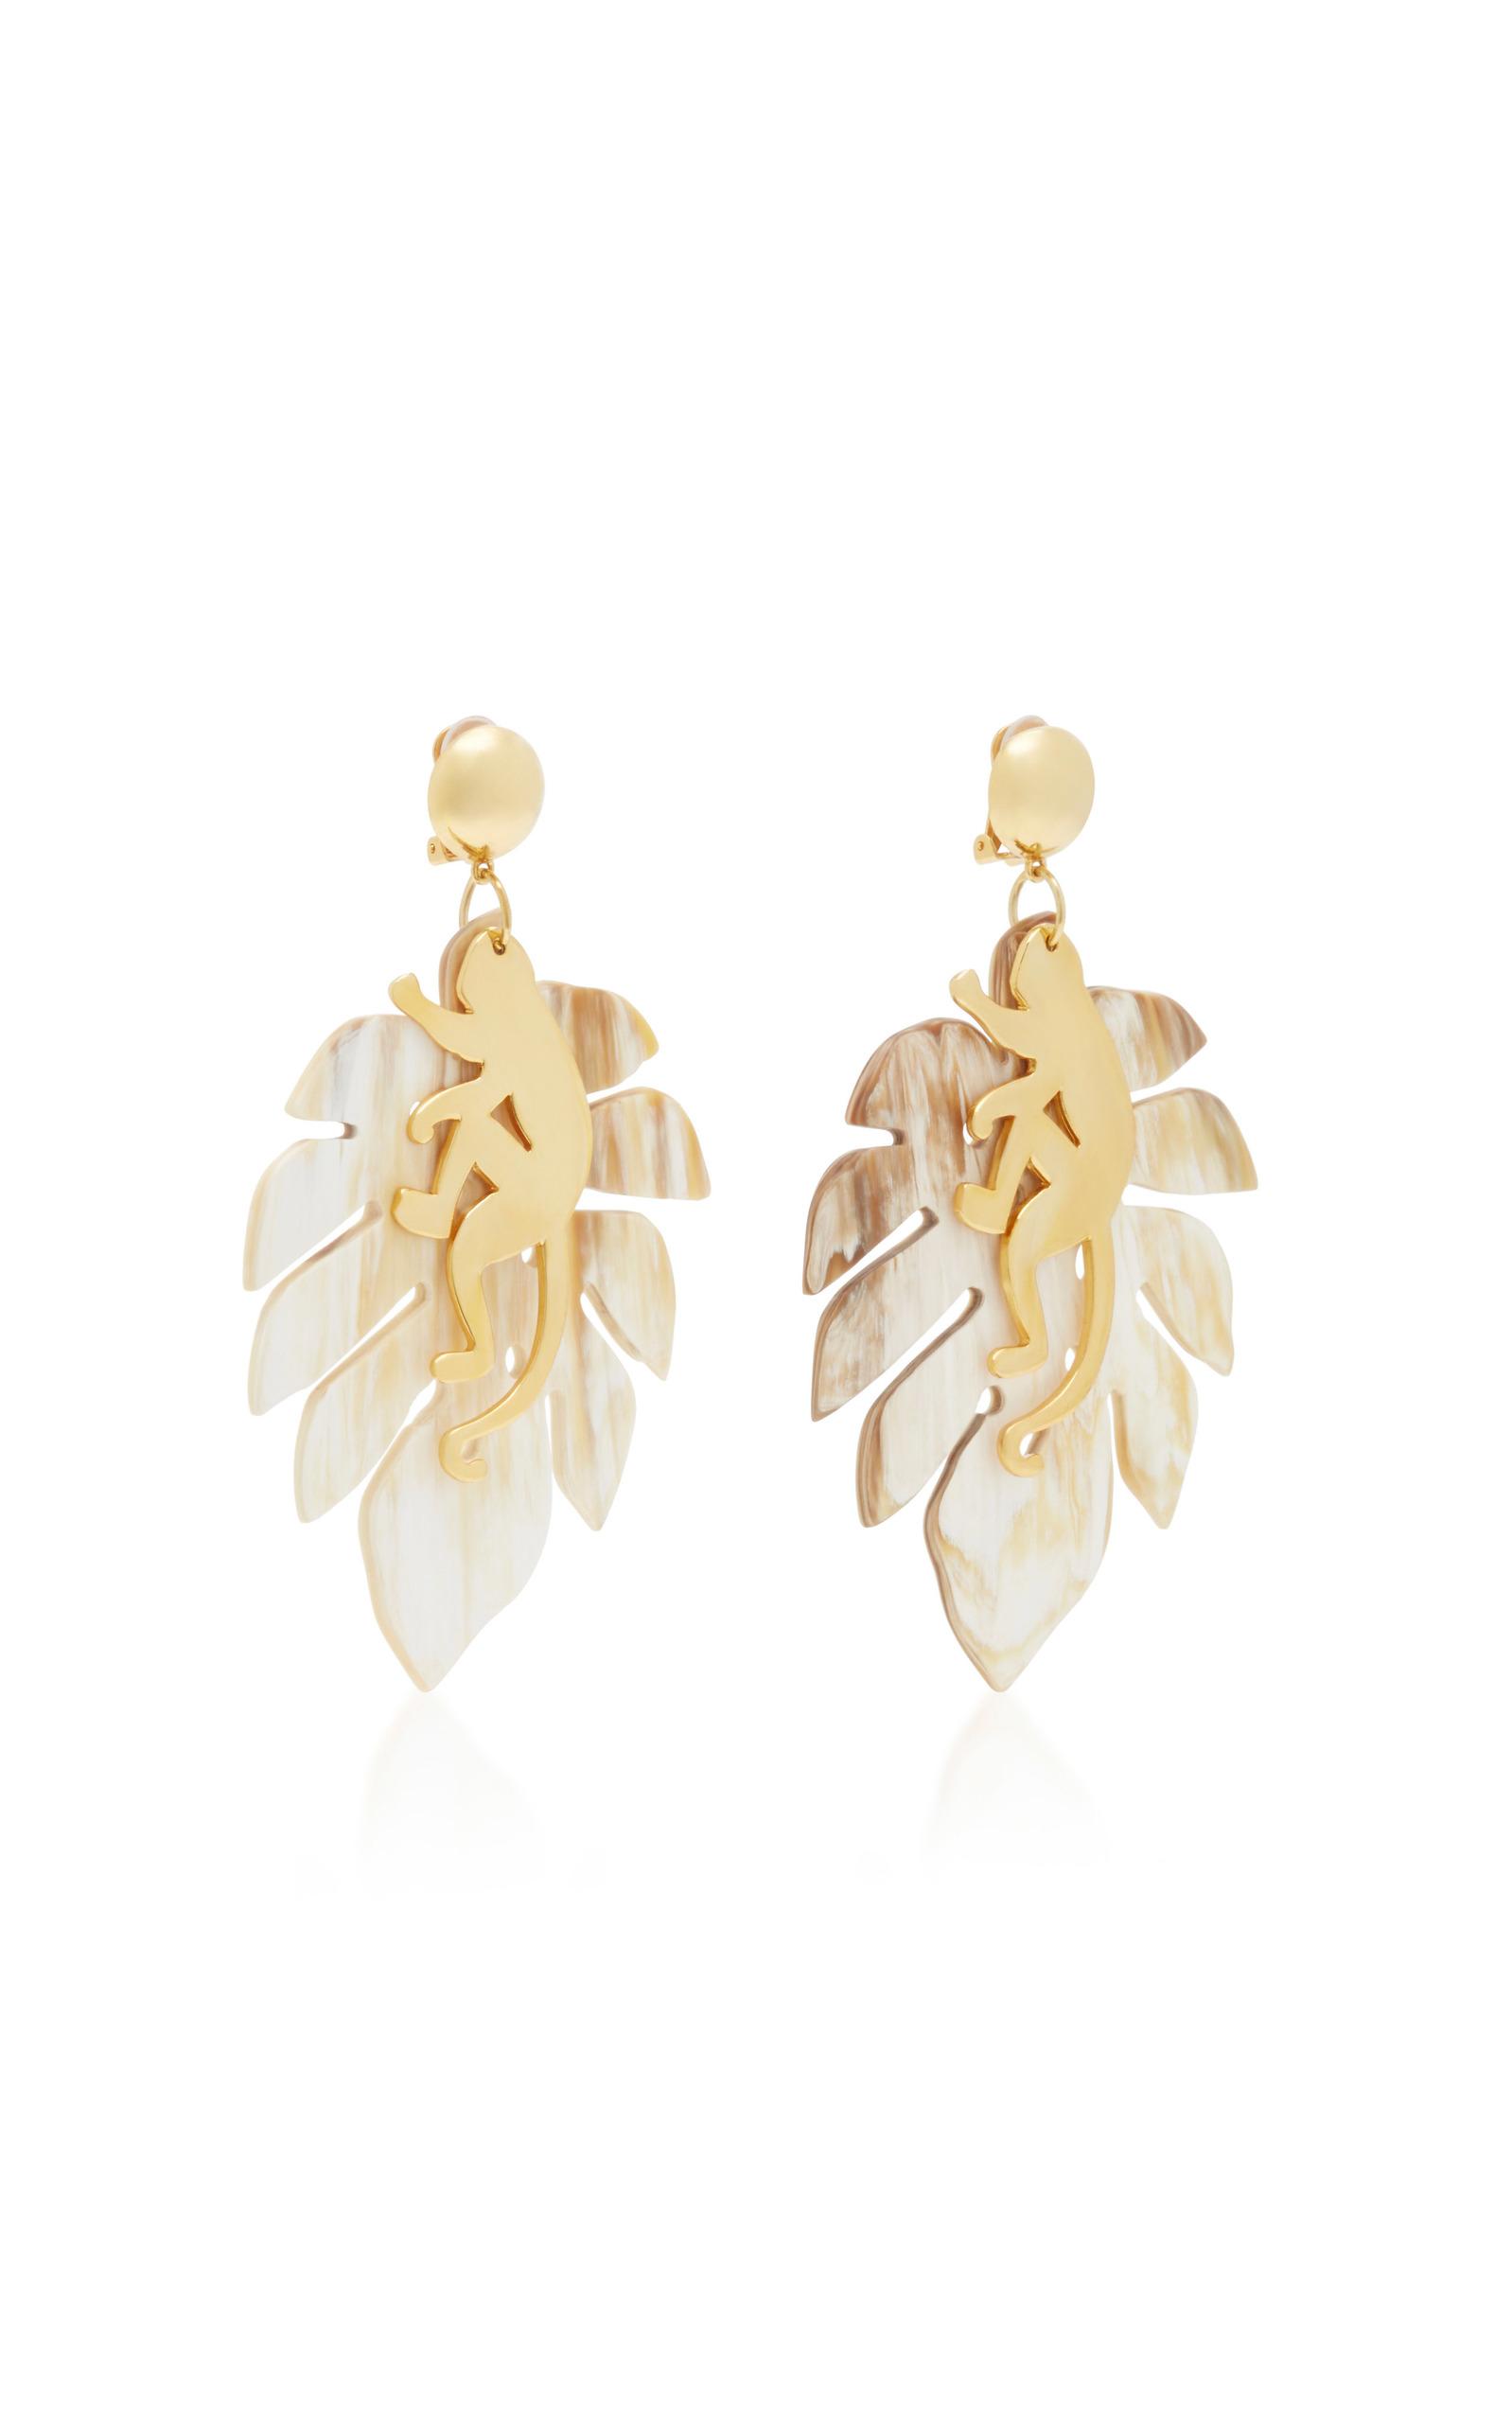 480441f50e8 Oscar De La Renta Earrings - Best All Earring Photos Kamilmaciol.Com